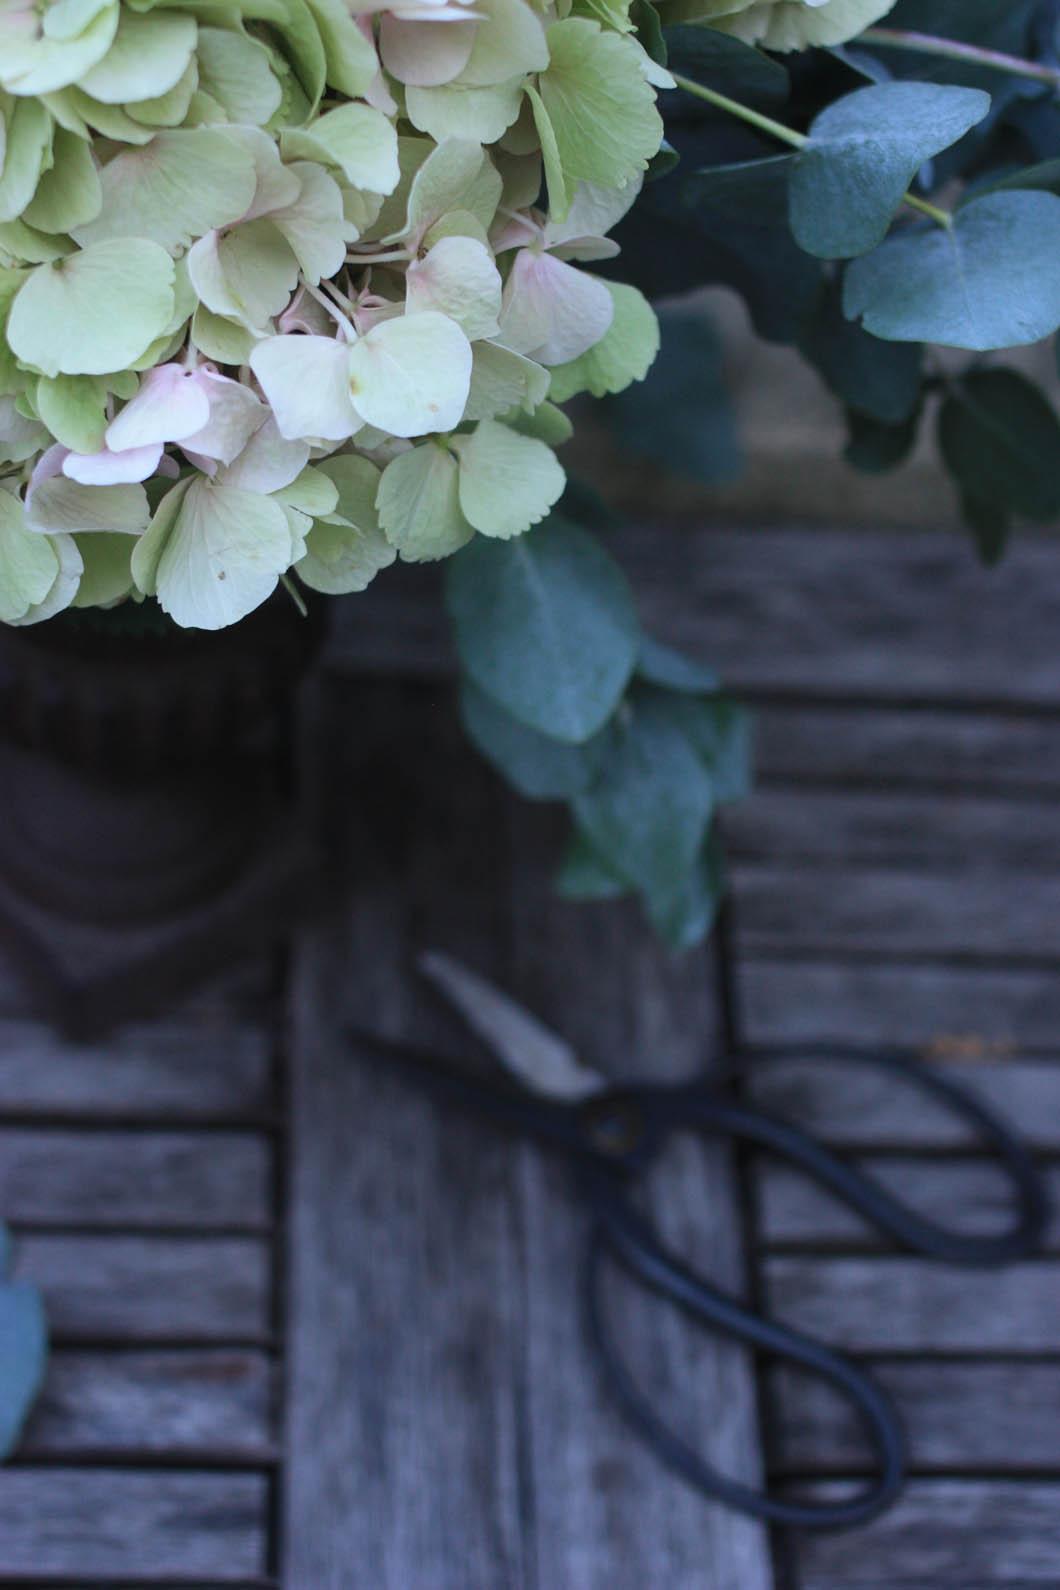 hydrangea and eucalyptus